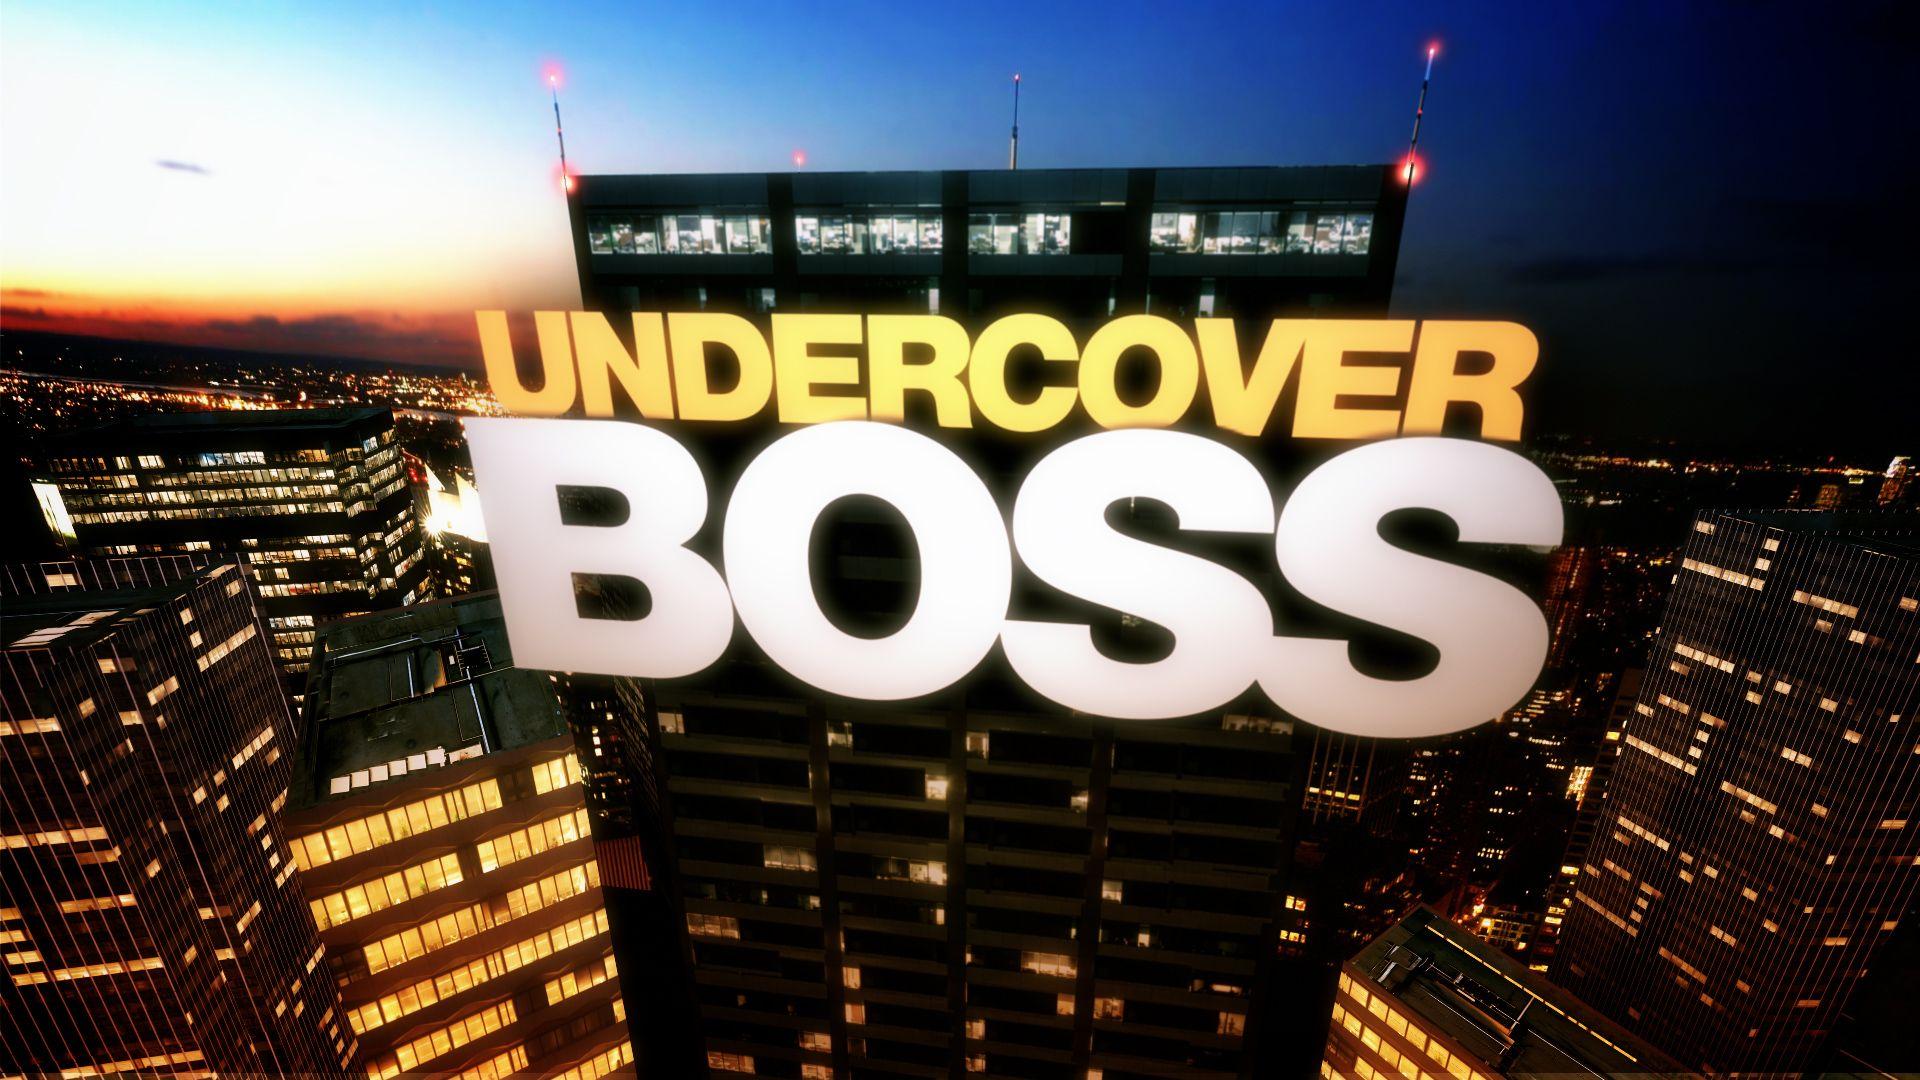 Undercover Boss: Season 3